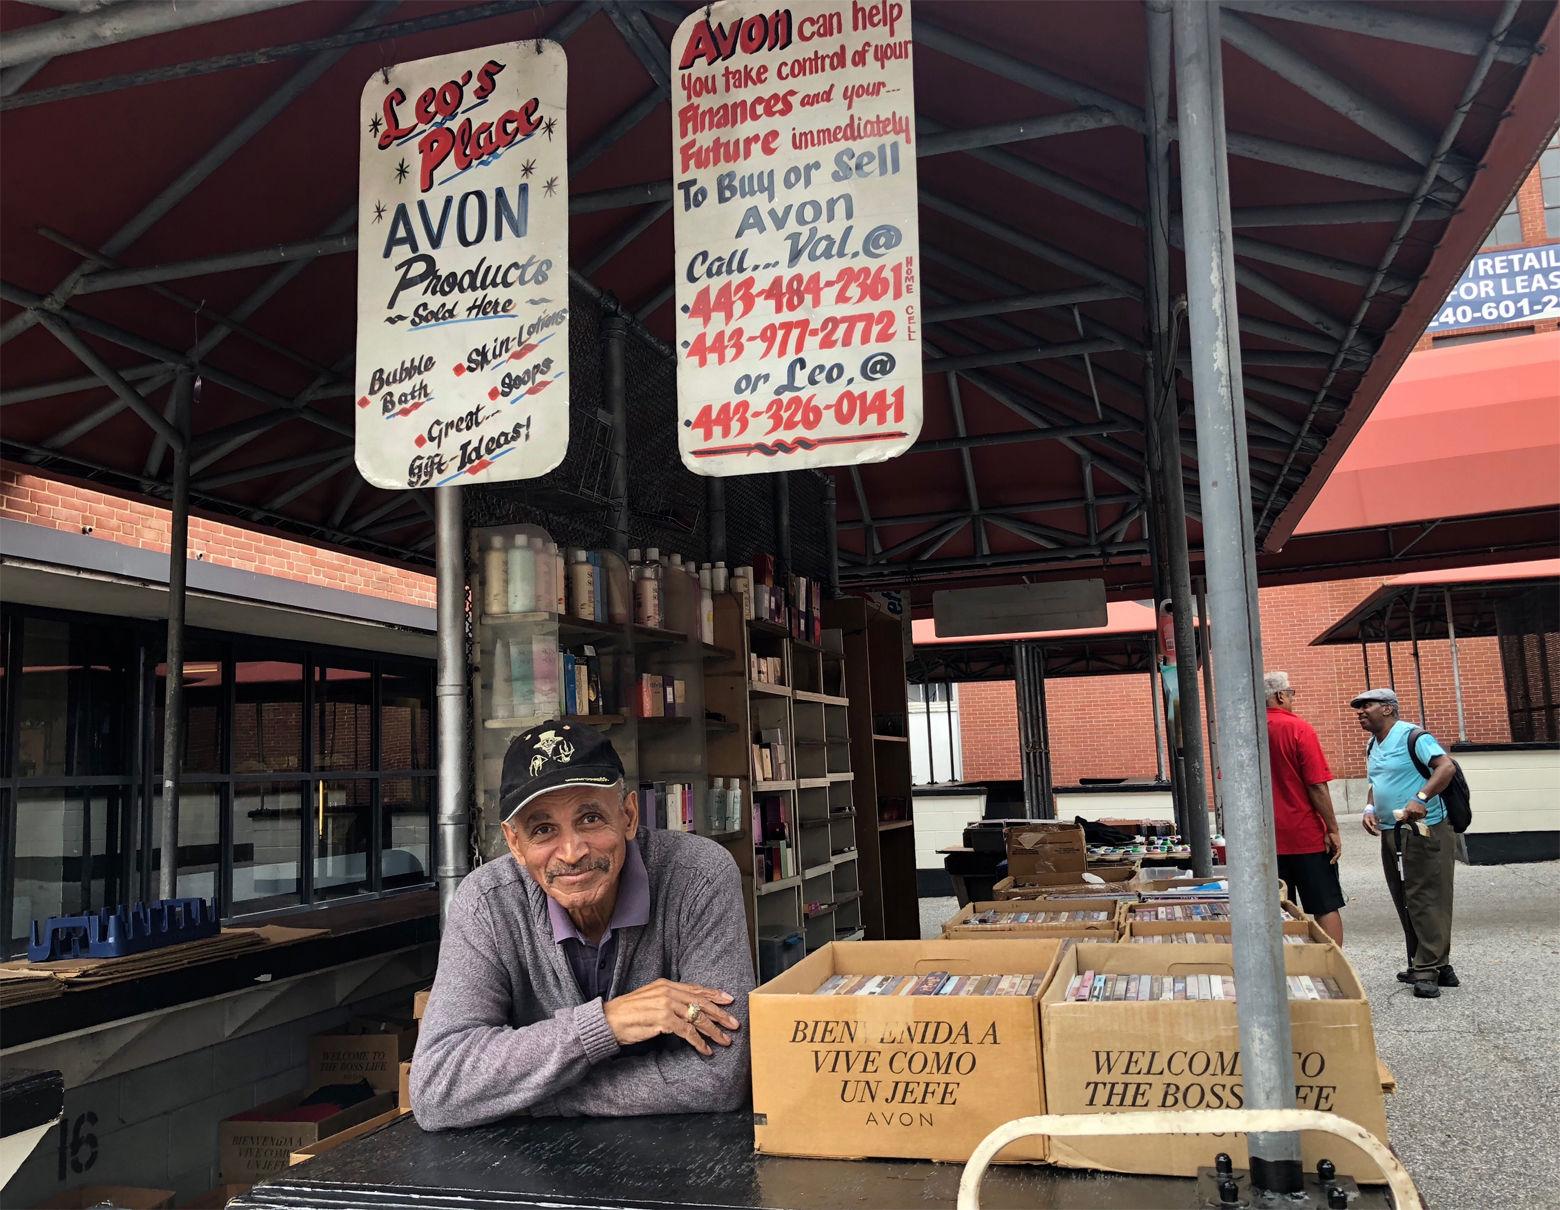 Leo Fonseca's spot at Lexington Market in Baltimore. (WTOP/Kate Ryan)